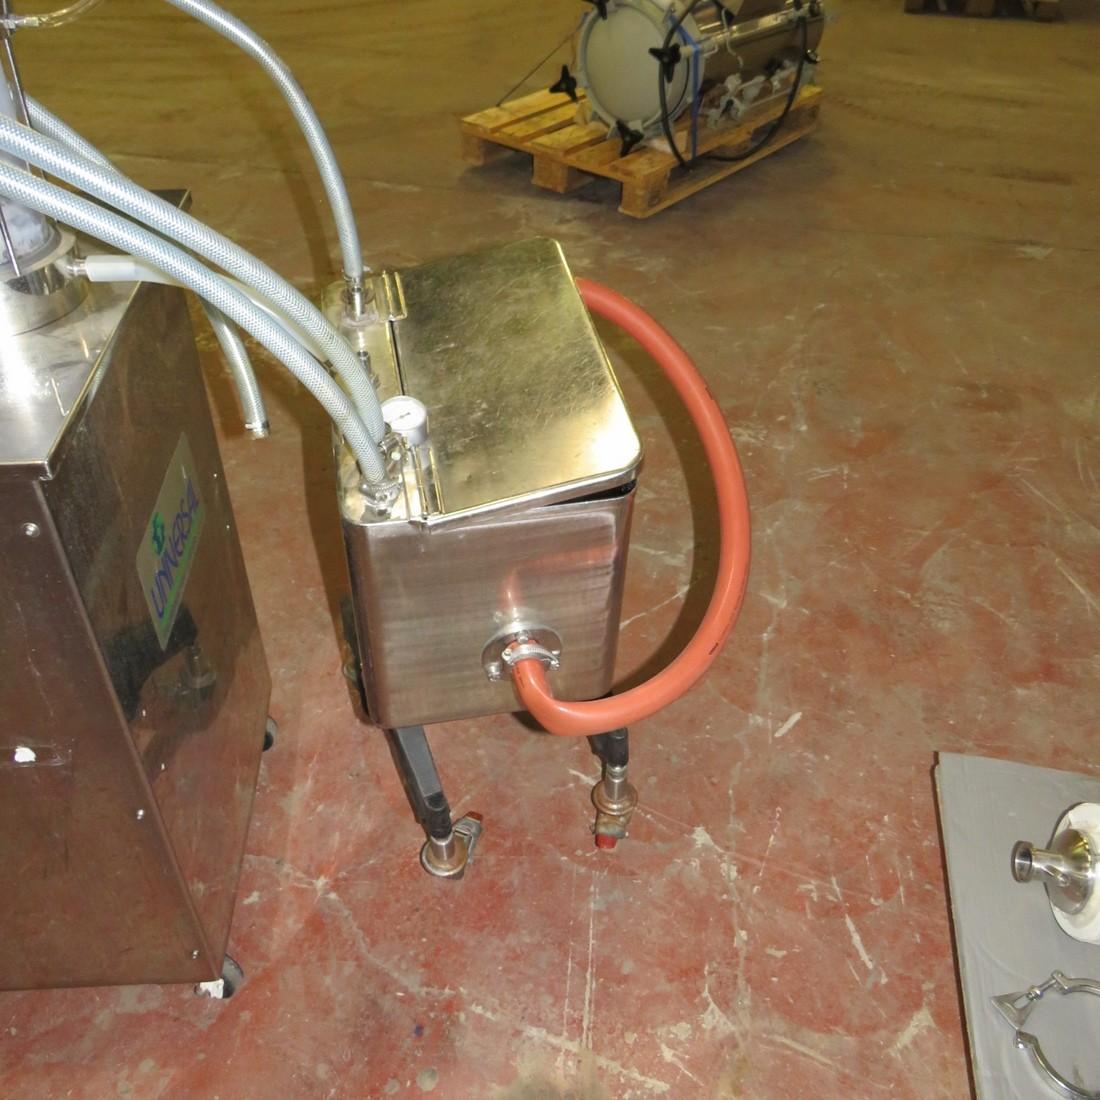 R11L1274 UNIVERSAL FILLING MACHINE COMPANY 4 head filler